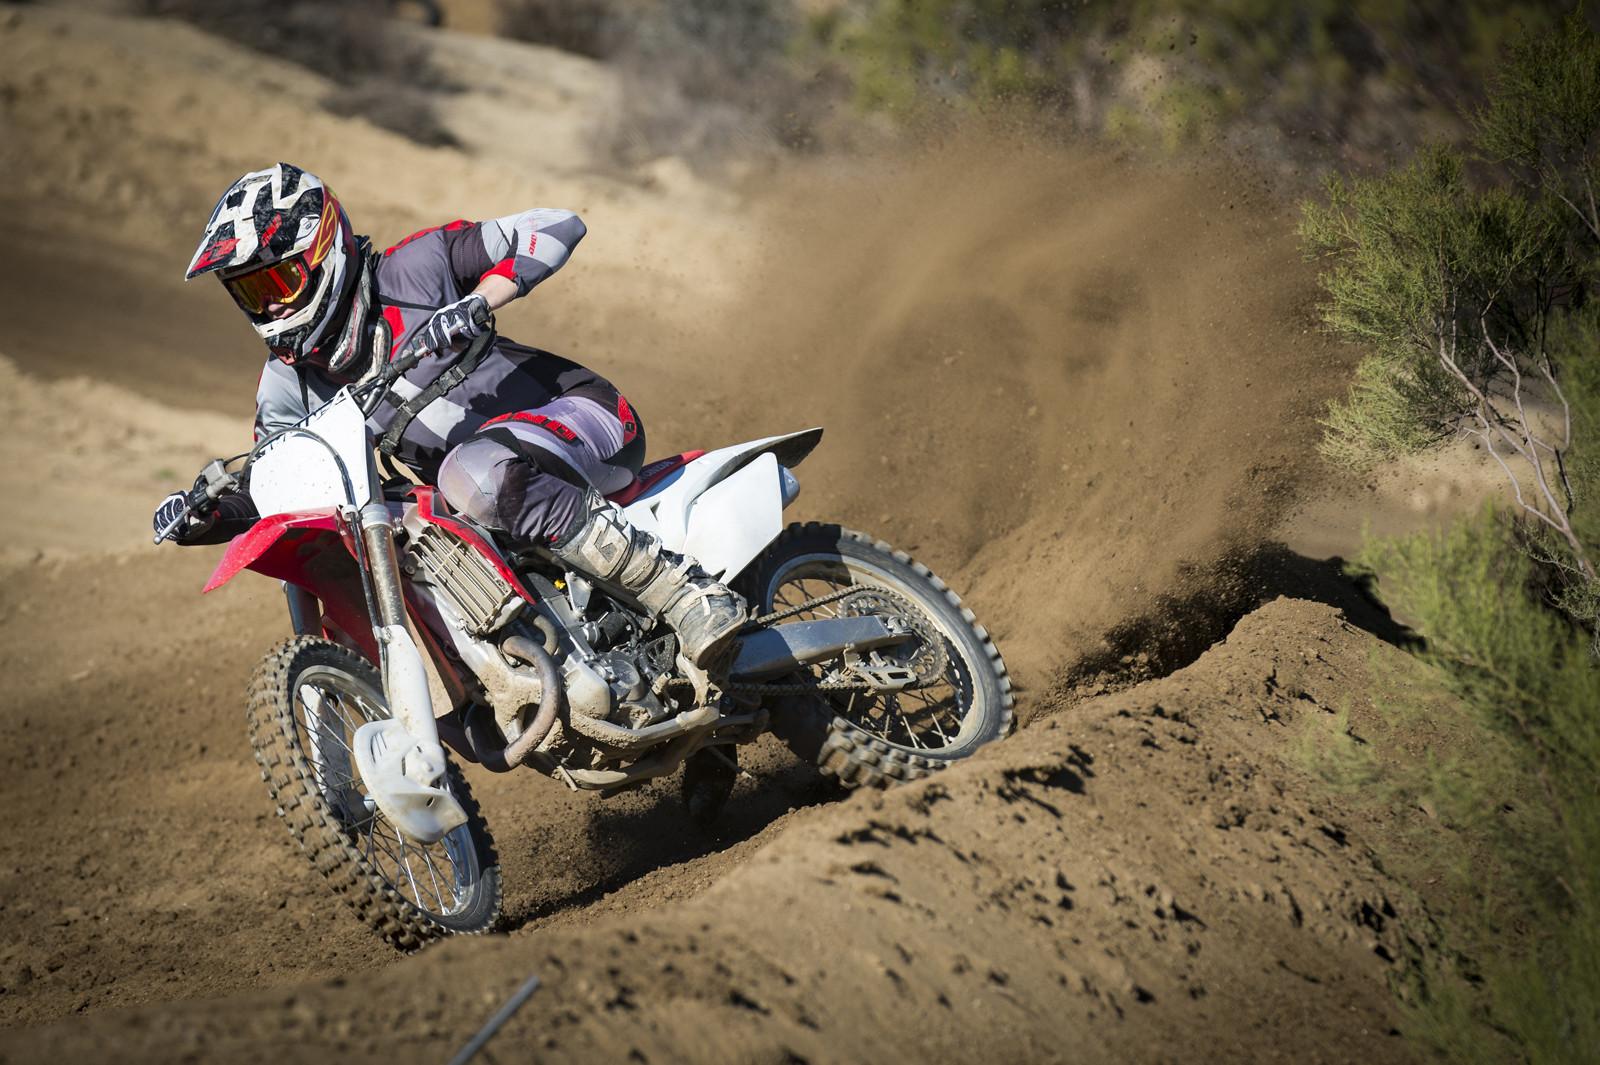 Austin Hackett Klaube - Ian Collins - Mountain Biking Pictures - Vital MTB